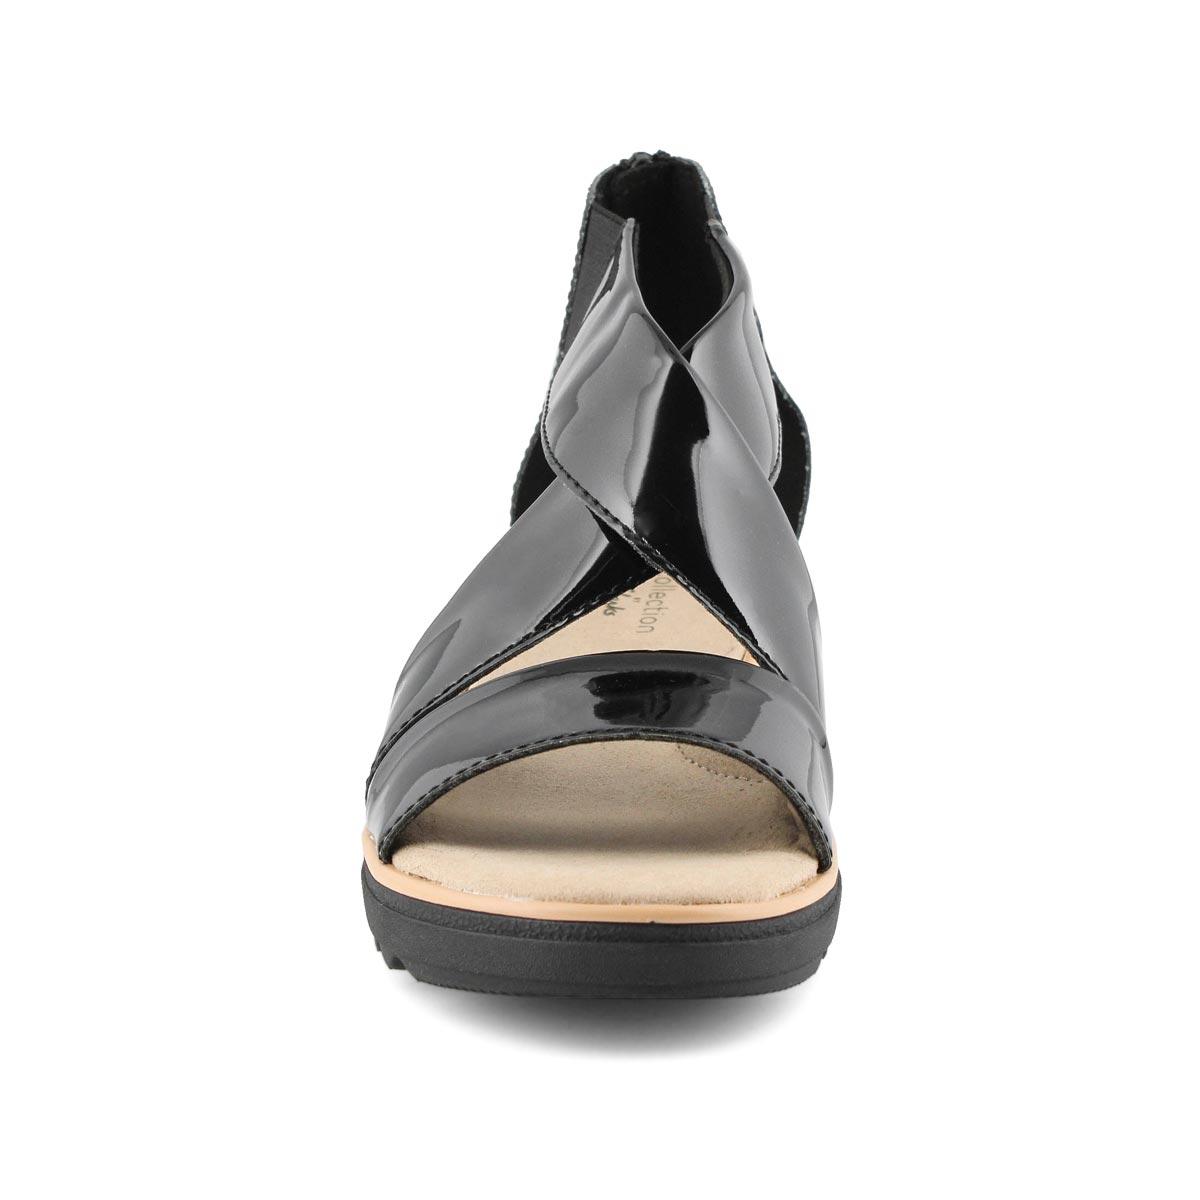 Lds Jillian Rise black pat wedge sandal